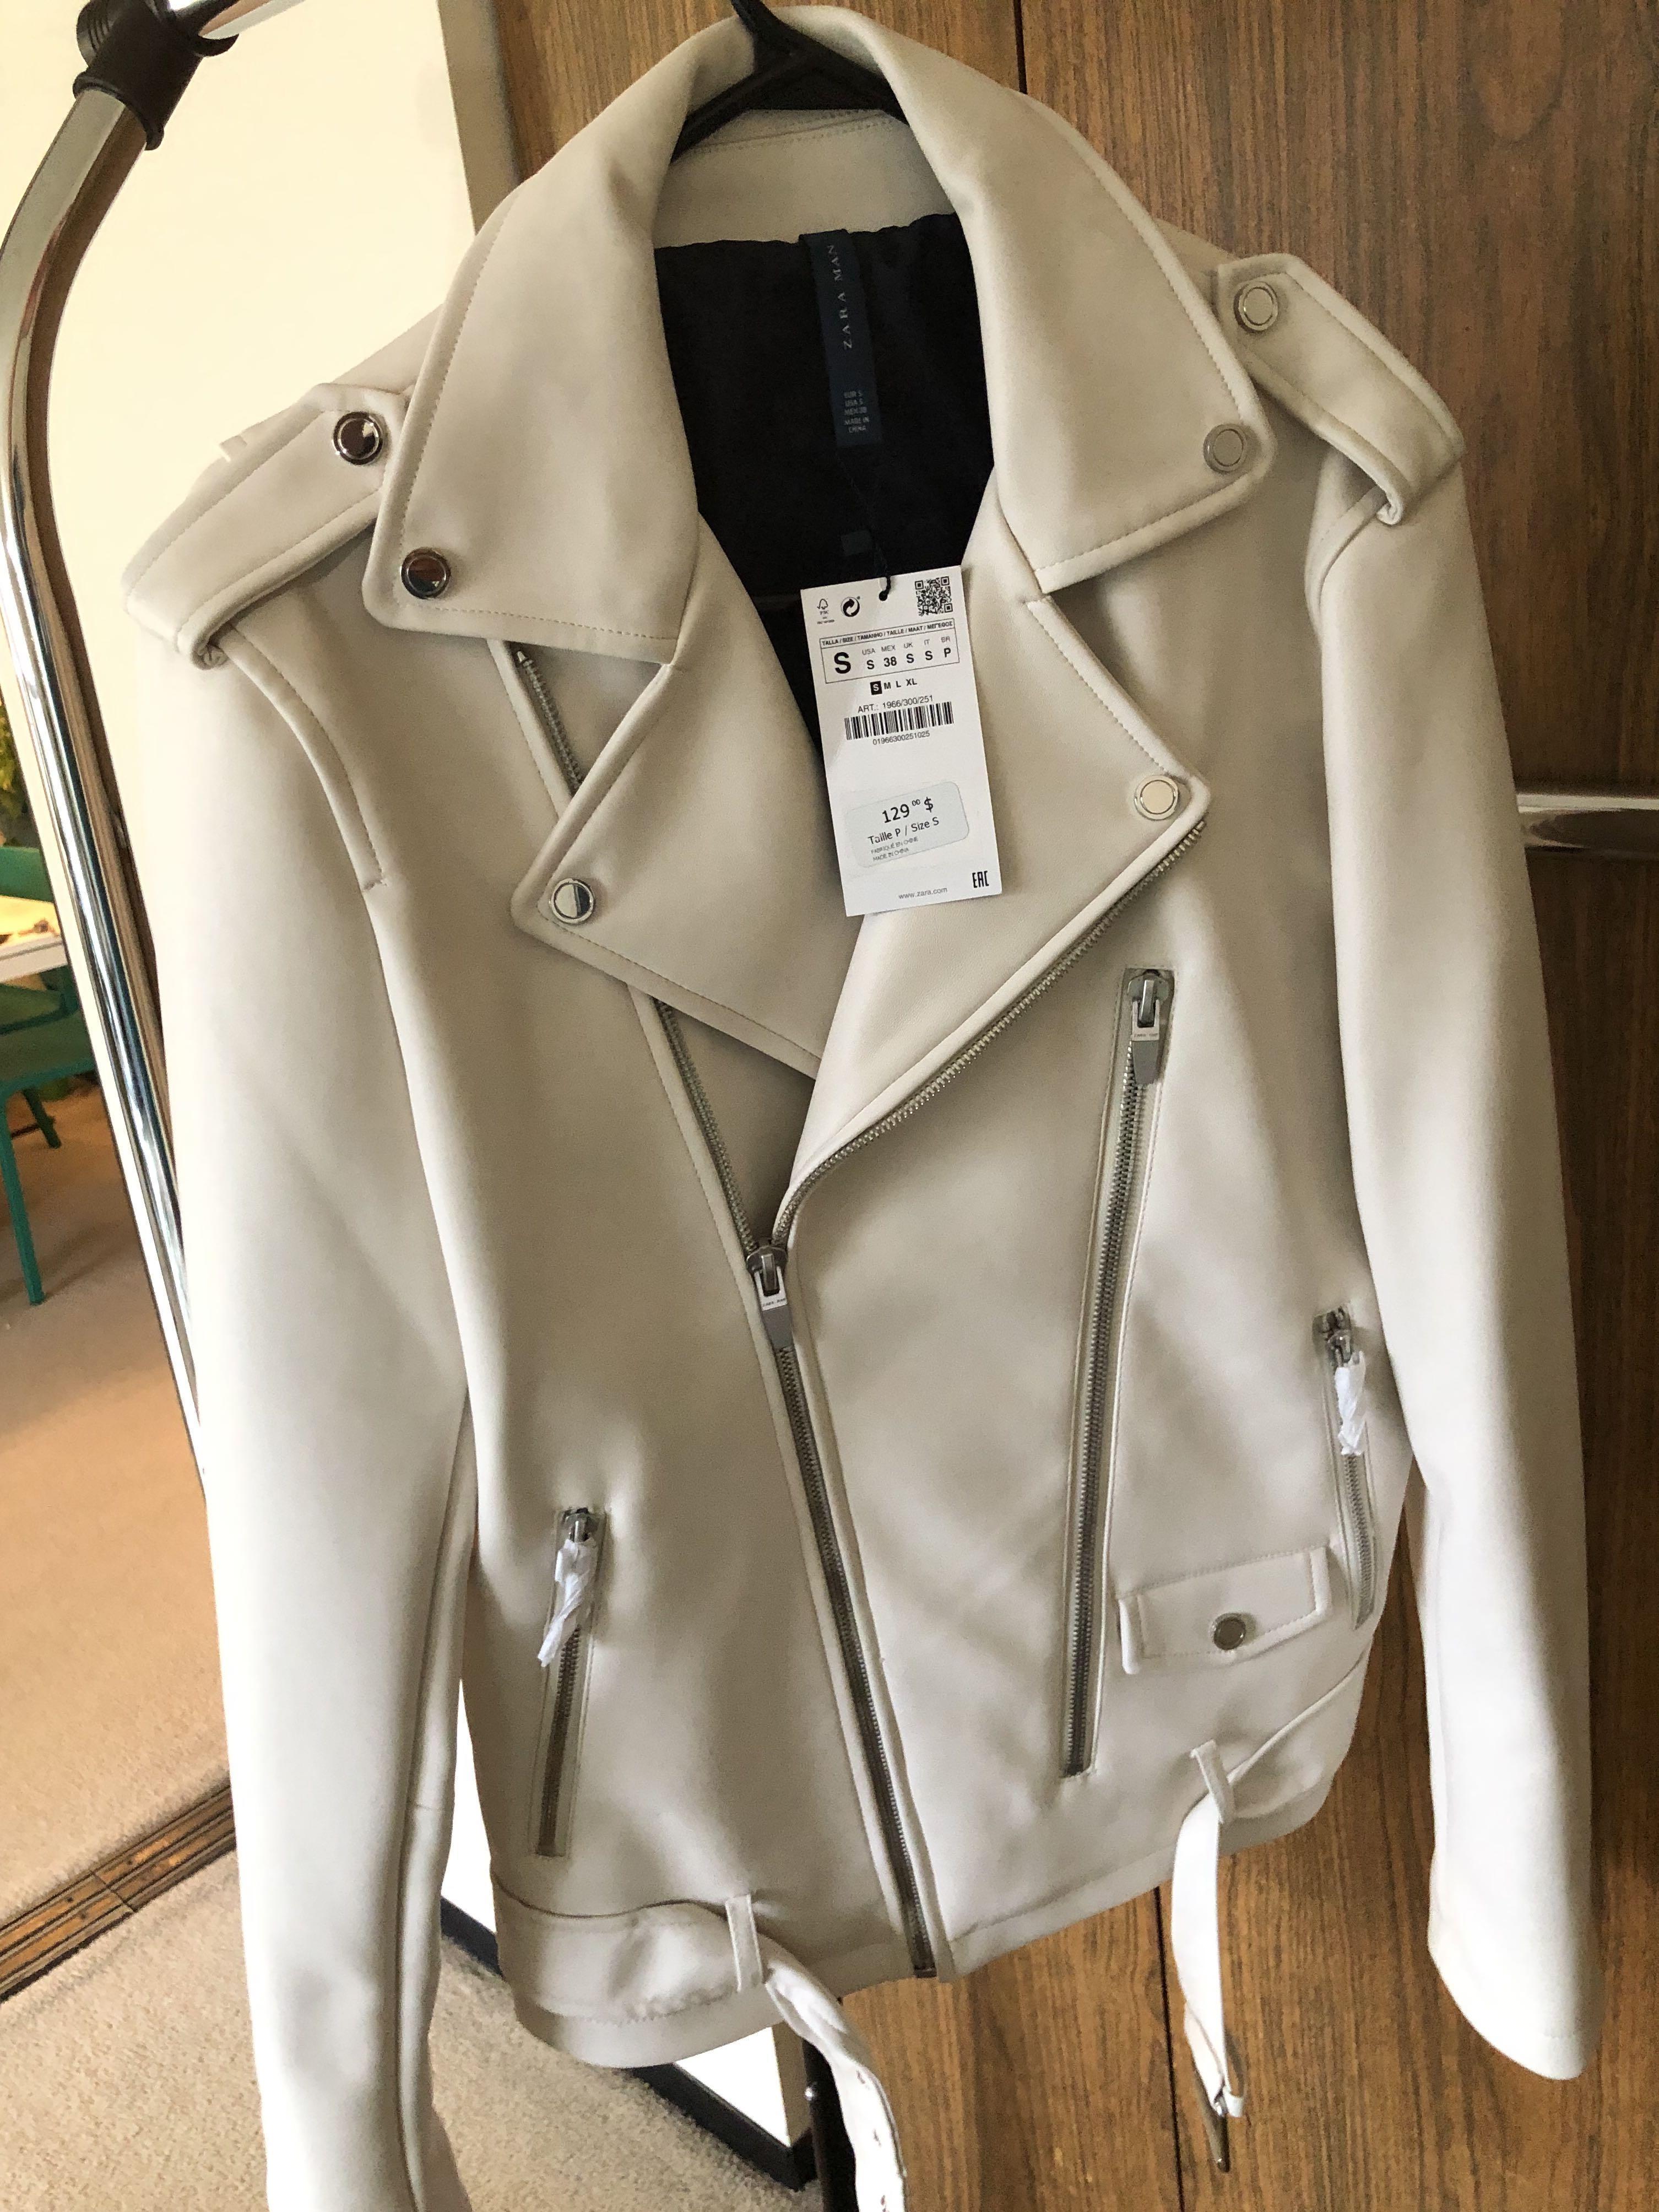 Zara Leather Biker Jacket - Small